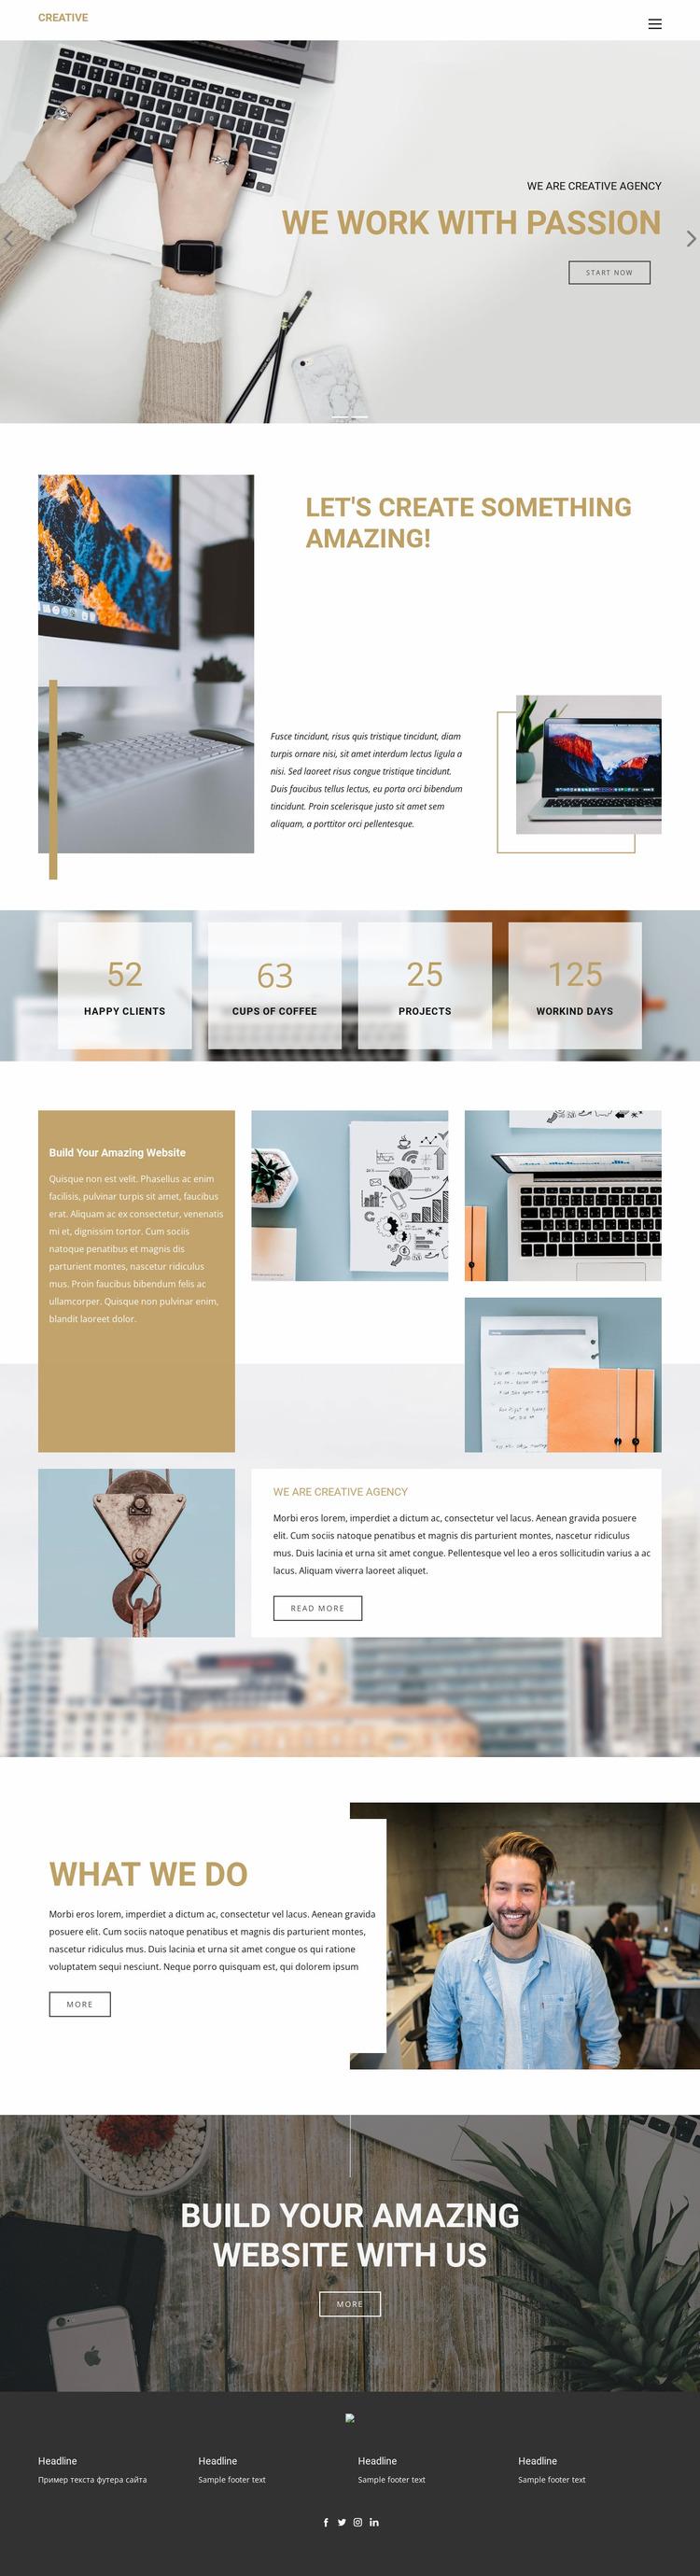 Exceptional creative designs Website Mockup